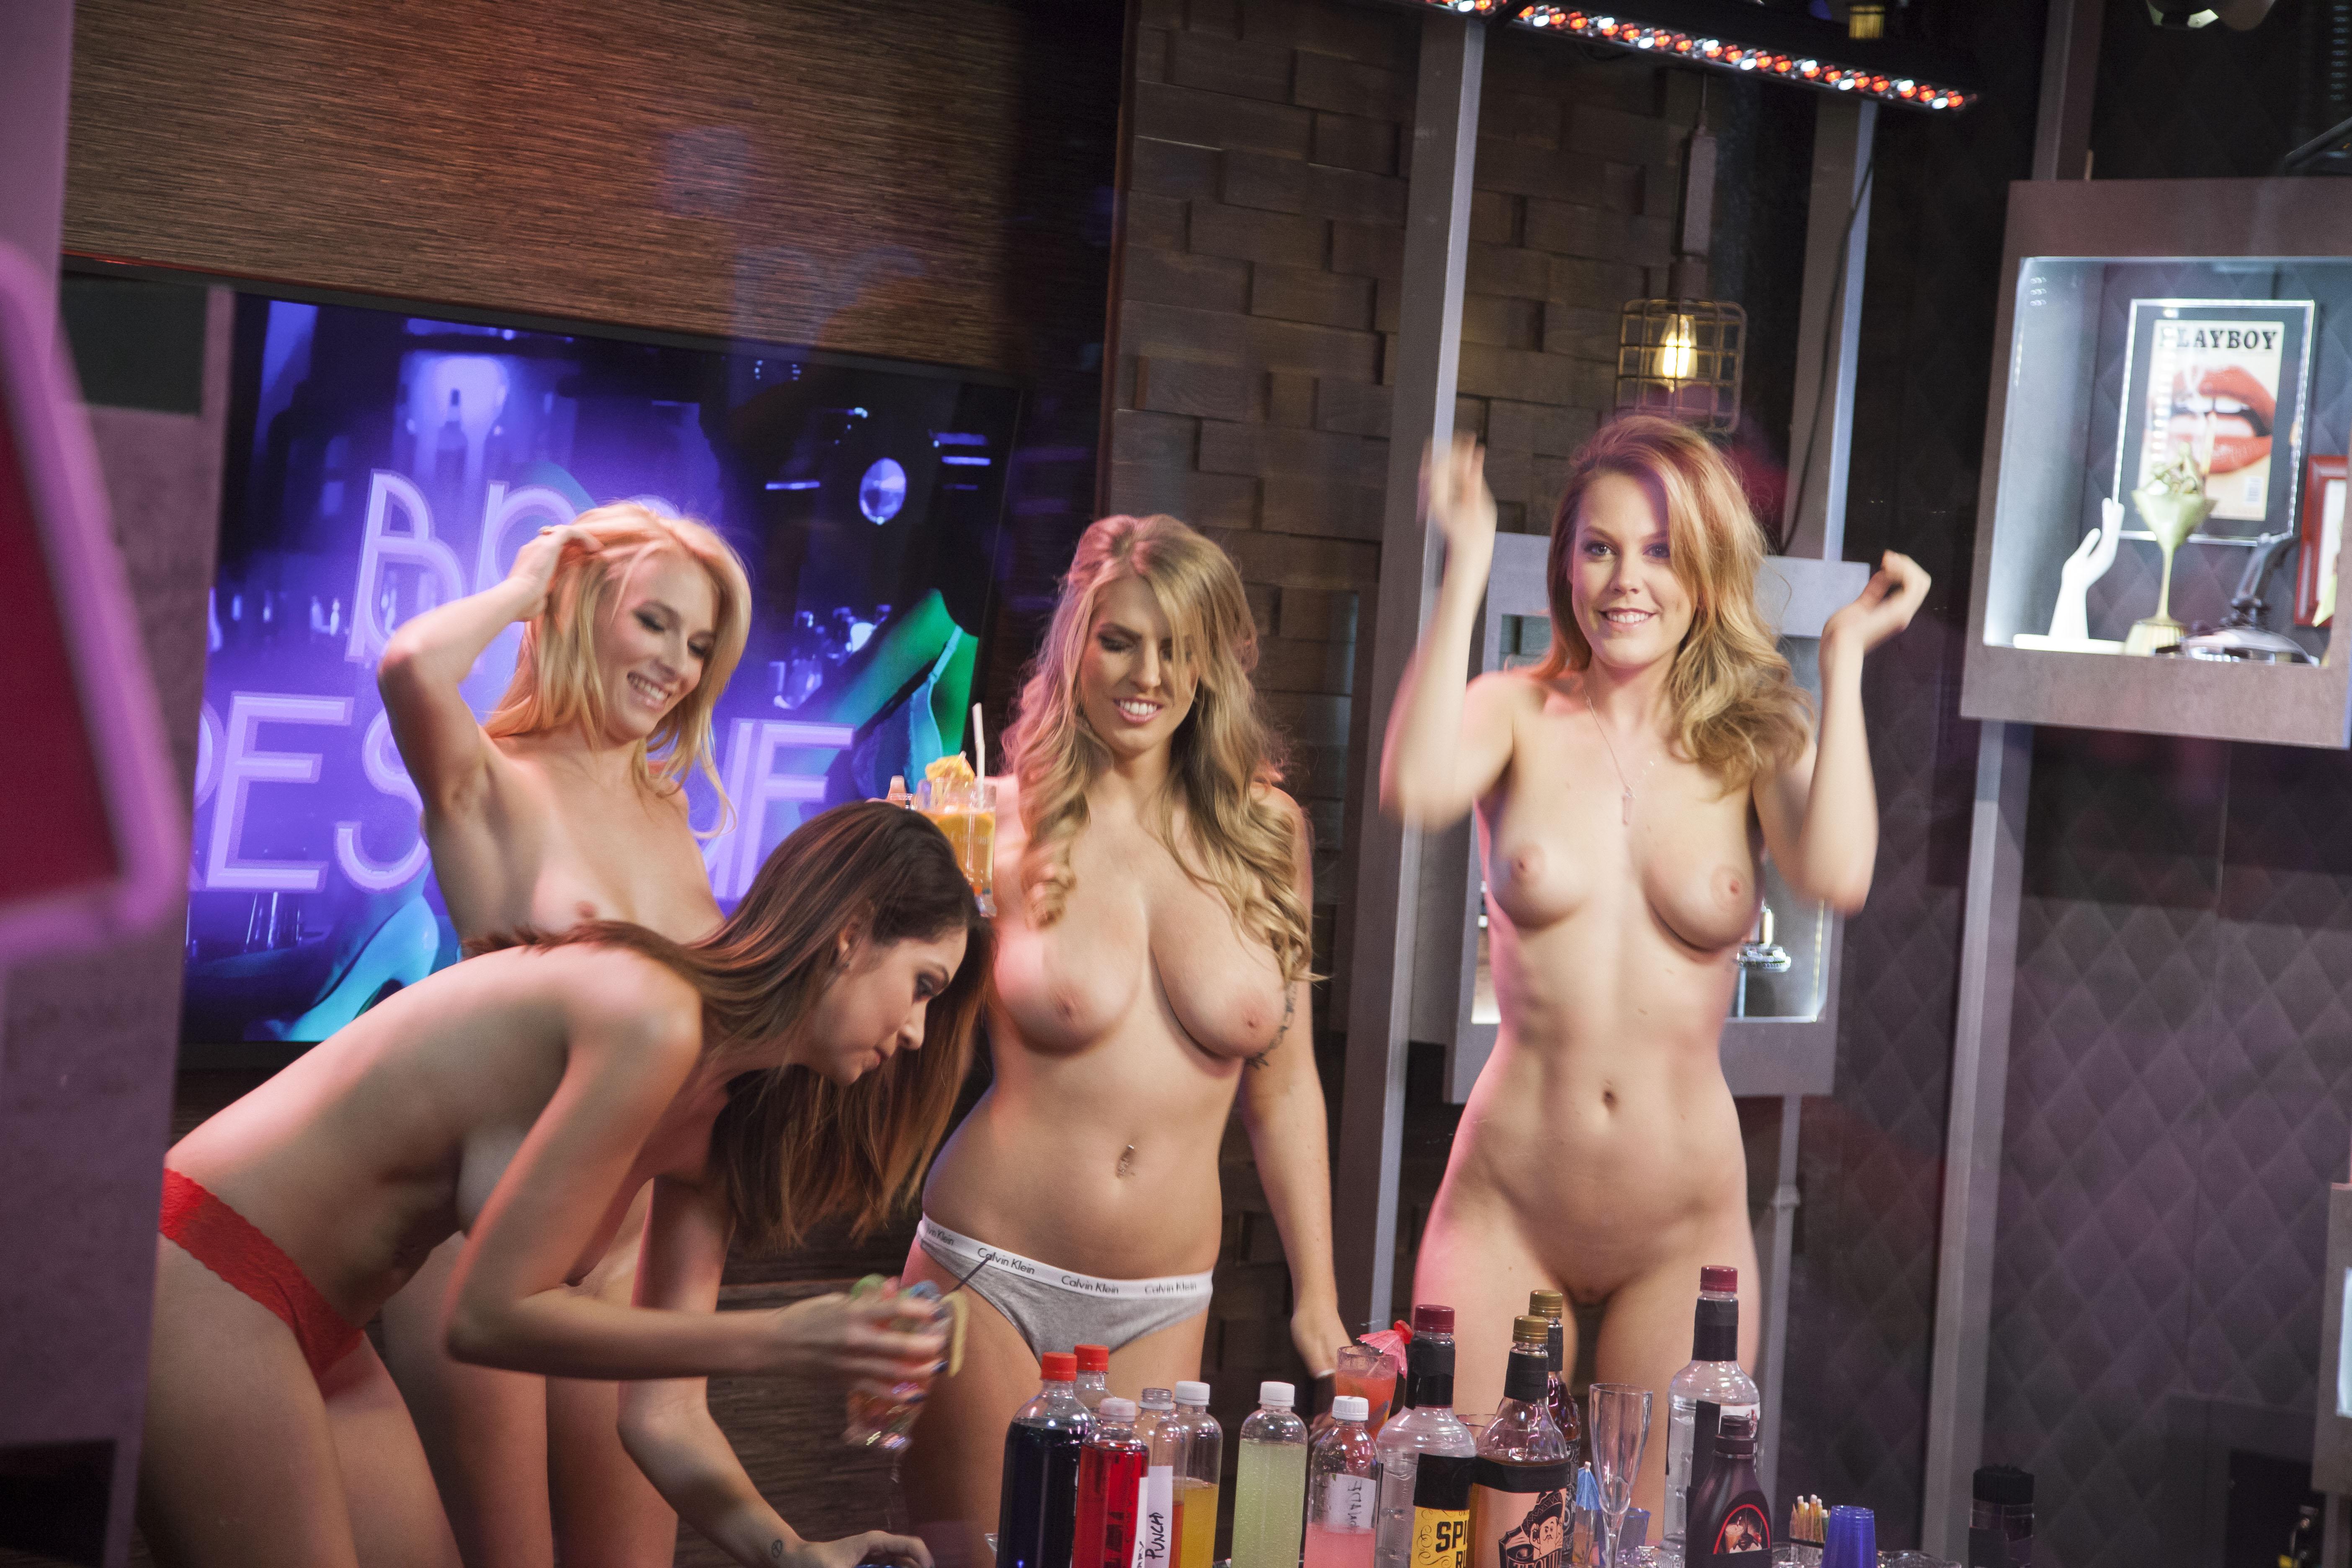 Naked Russian Girls On Nudist Beach Russian Sexy Girls